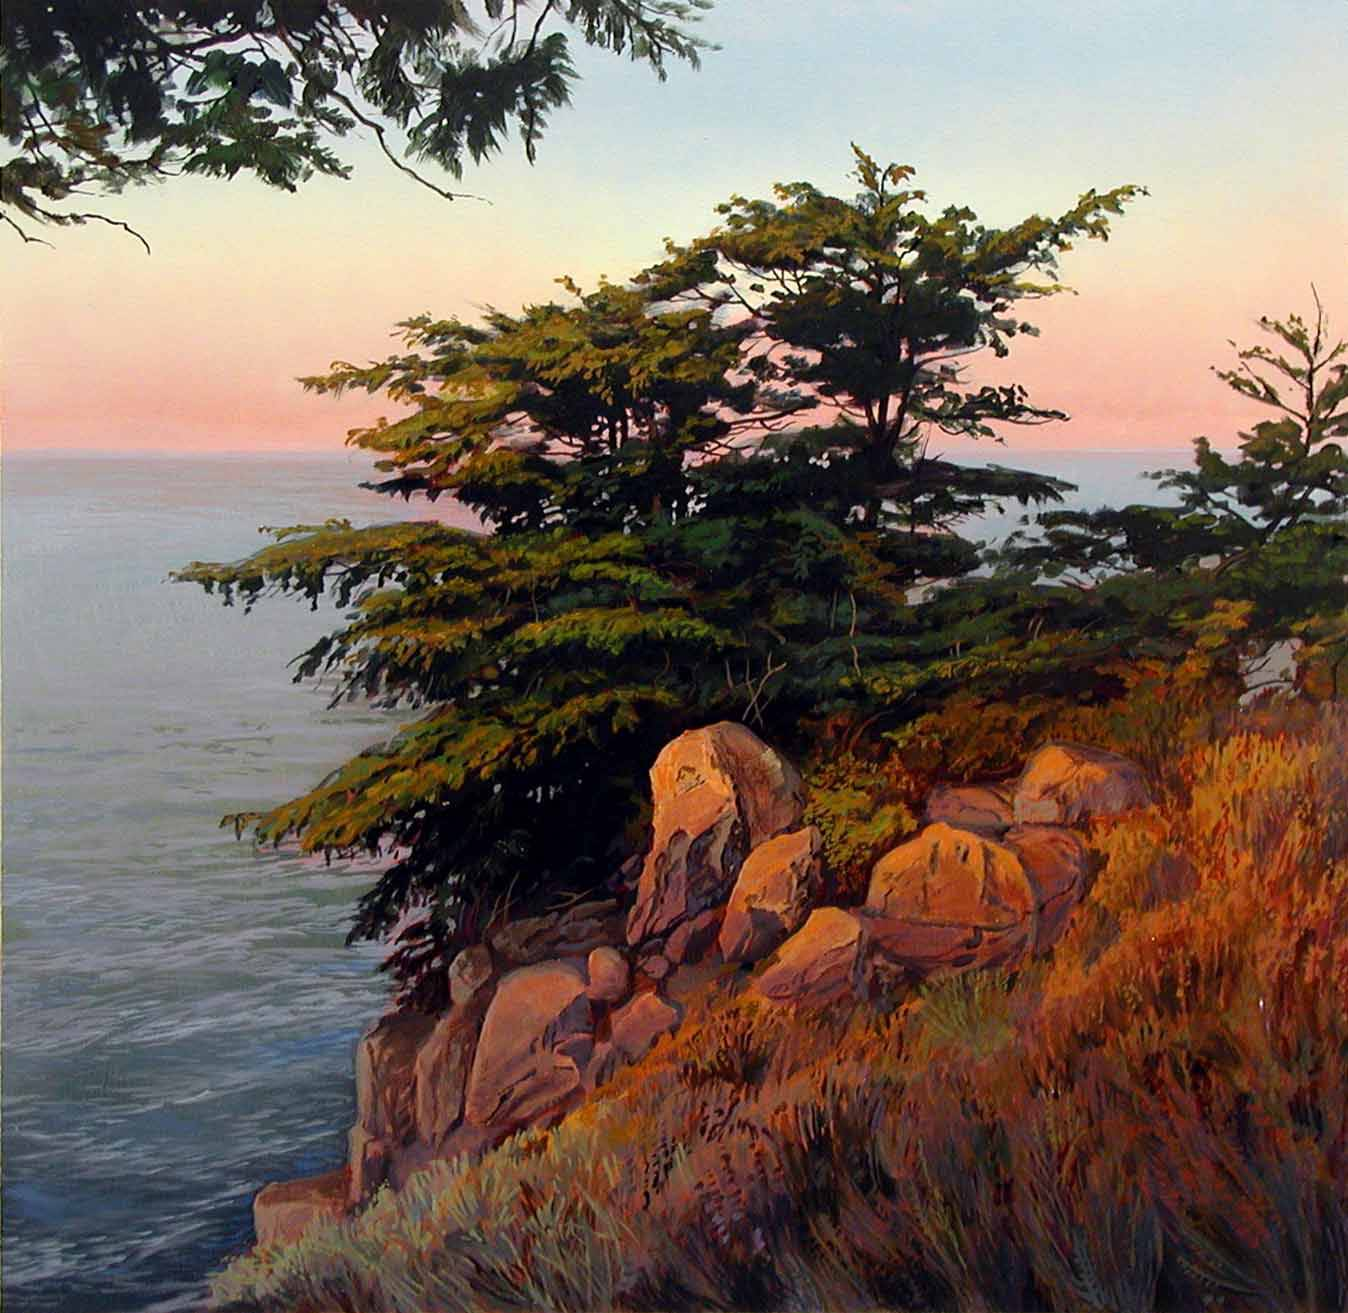 Калифорнийское побережье к югу от Кармель